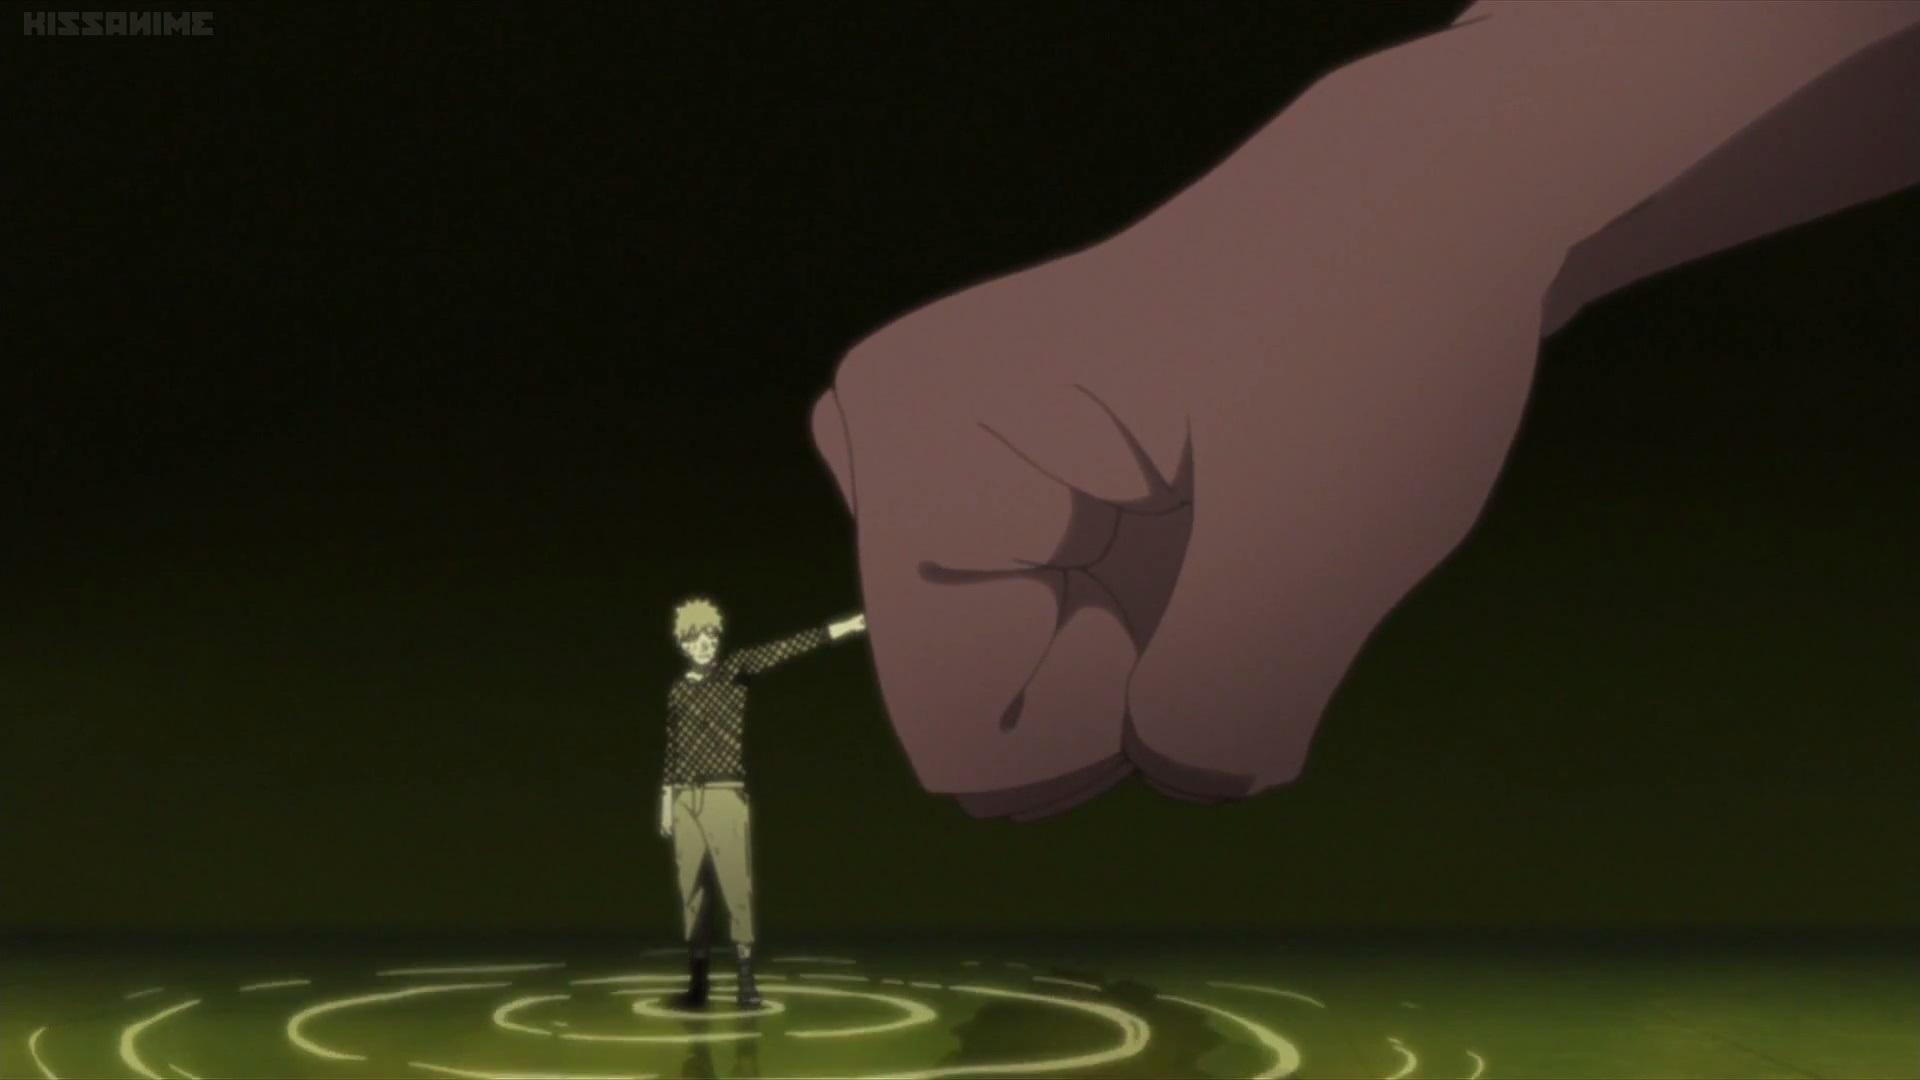 Best Wallpaper Naruto Emotional - Naruto-Fist-Bump  Image_273810.jpg